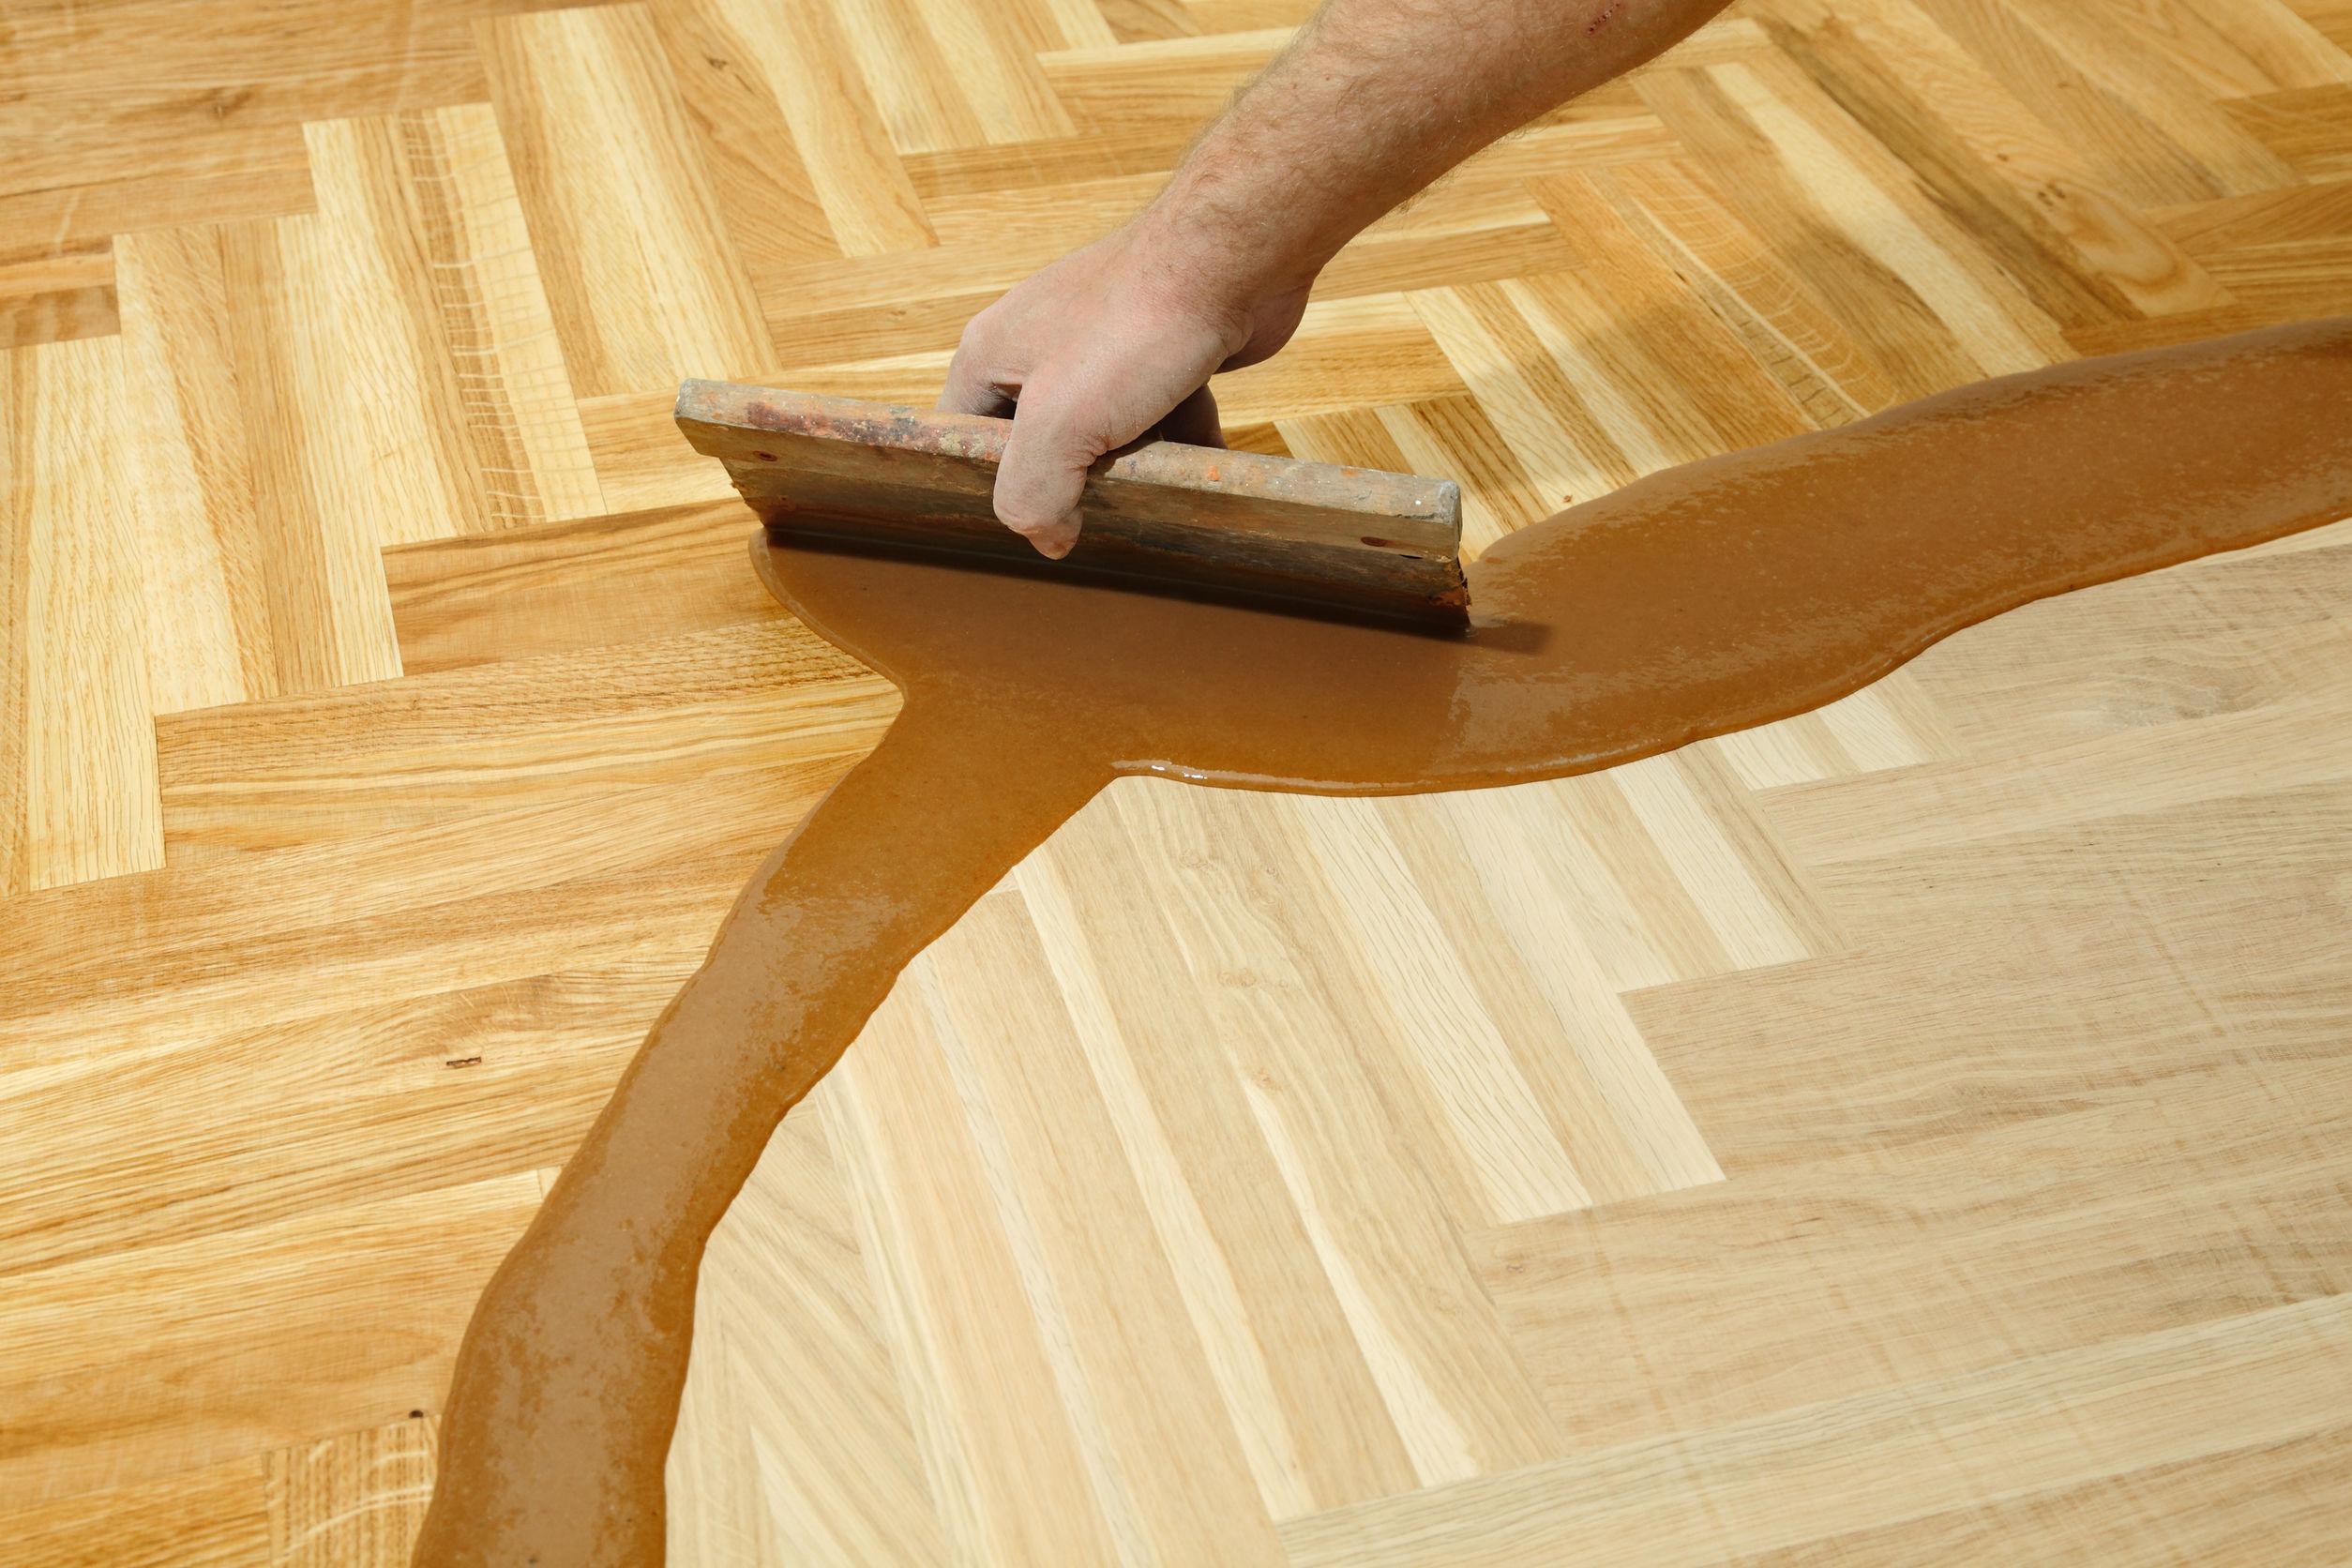 24527478 Varnishing Of Oak Parquet Floor Workers Hand And Tool